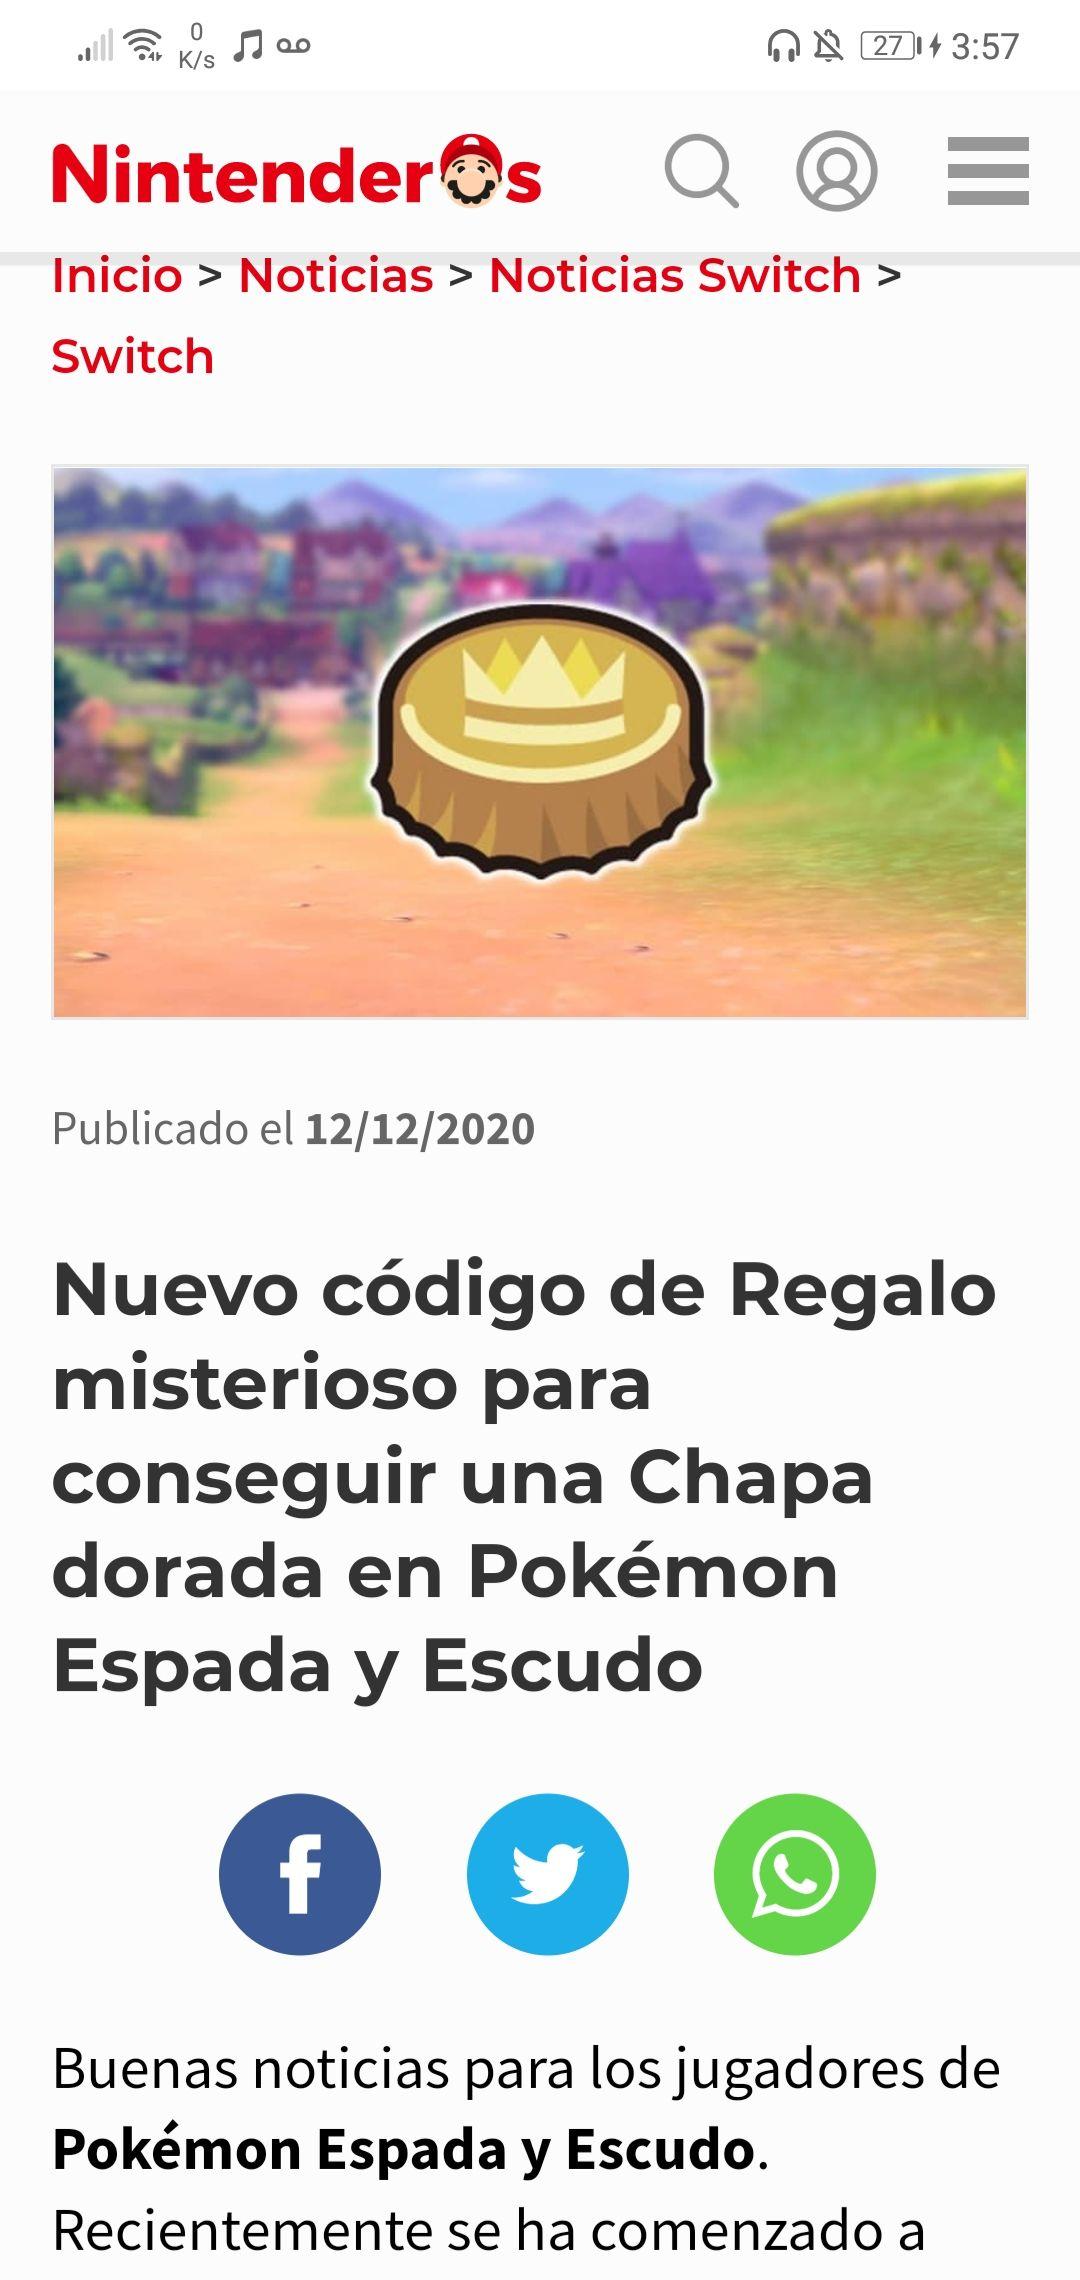 Pokémon: Cupón para pokemon espada y escudo